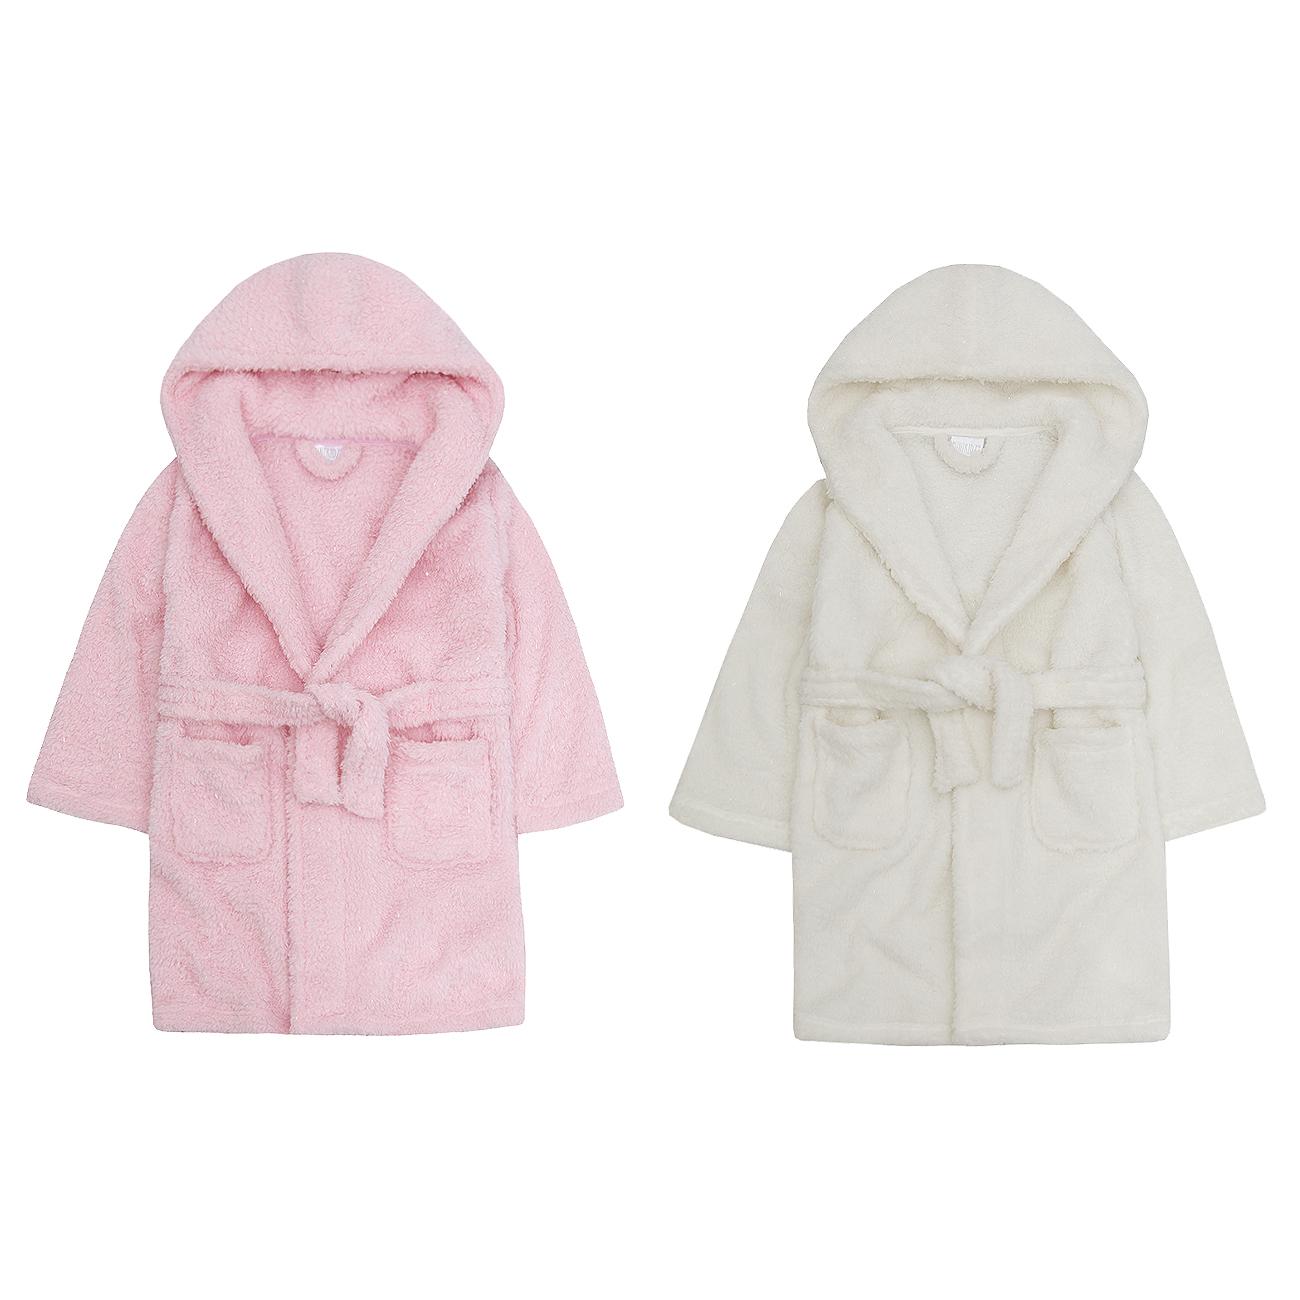 MiniKidz Infant Girls Sparkle Snuggle Fleece Dressing Gown Hooded ...